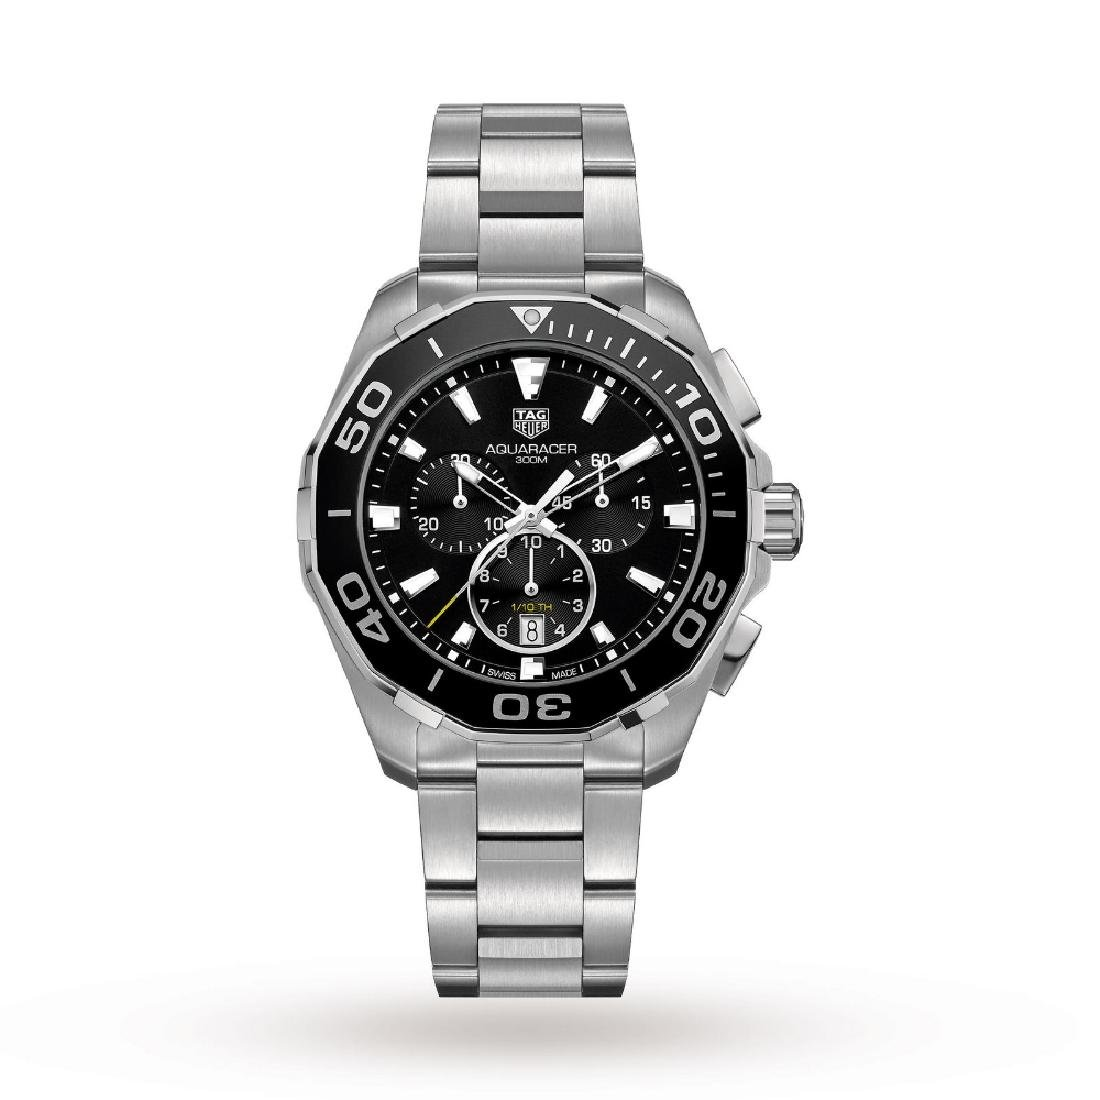 2015 model-TAG HEUER Aquaracer Grande Date Chronograph